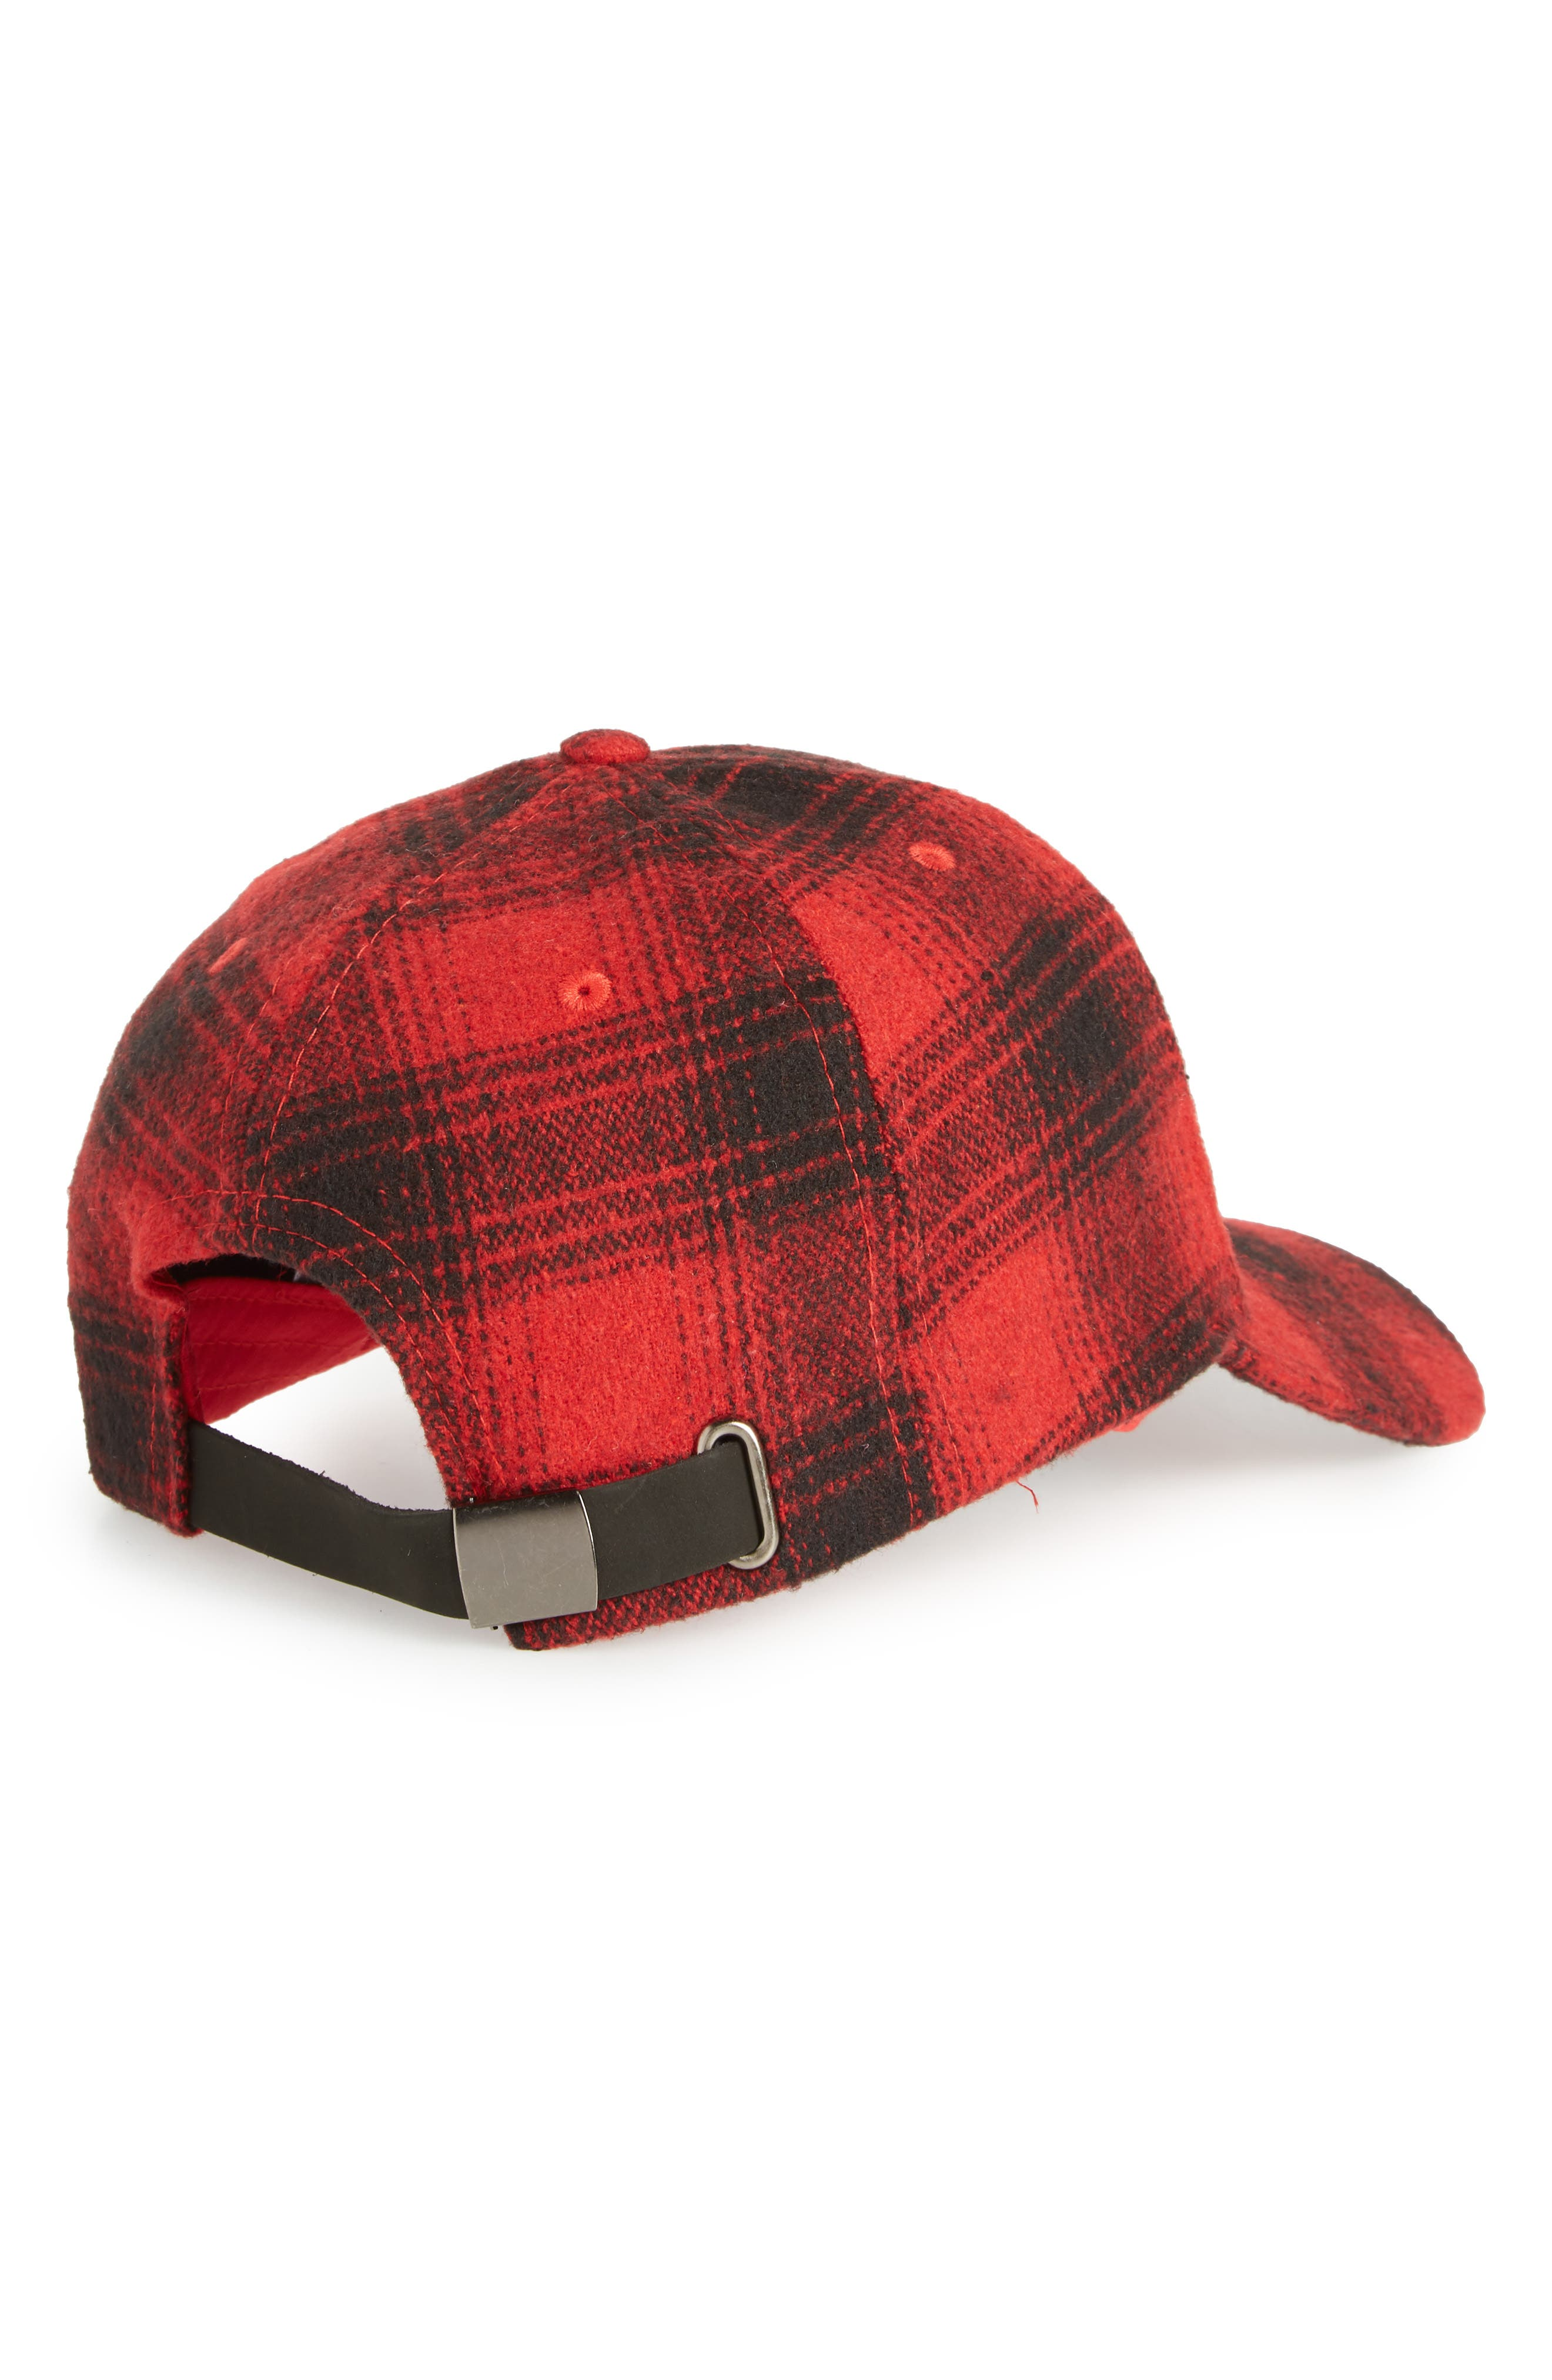 Buffalo Check Baseball Cap,                             Alternate thumbnail 2, color,                             RED CHINOISE